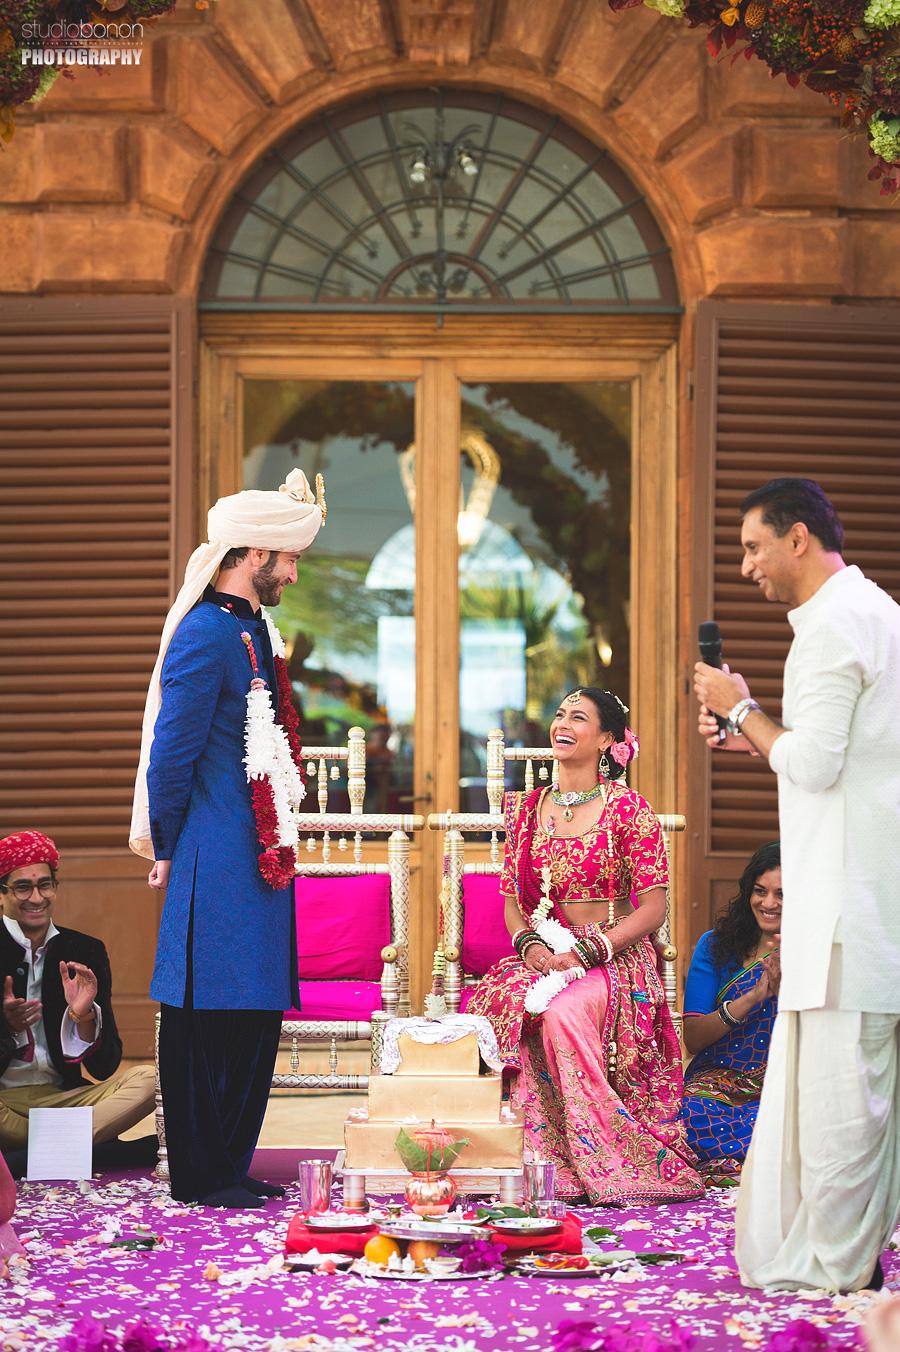 133-epic-indian-wedding-ceremony-bridegroom